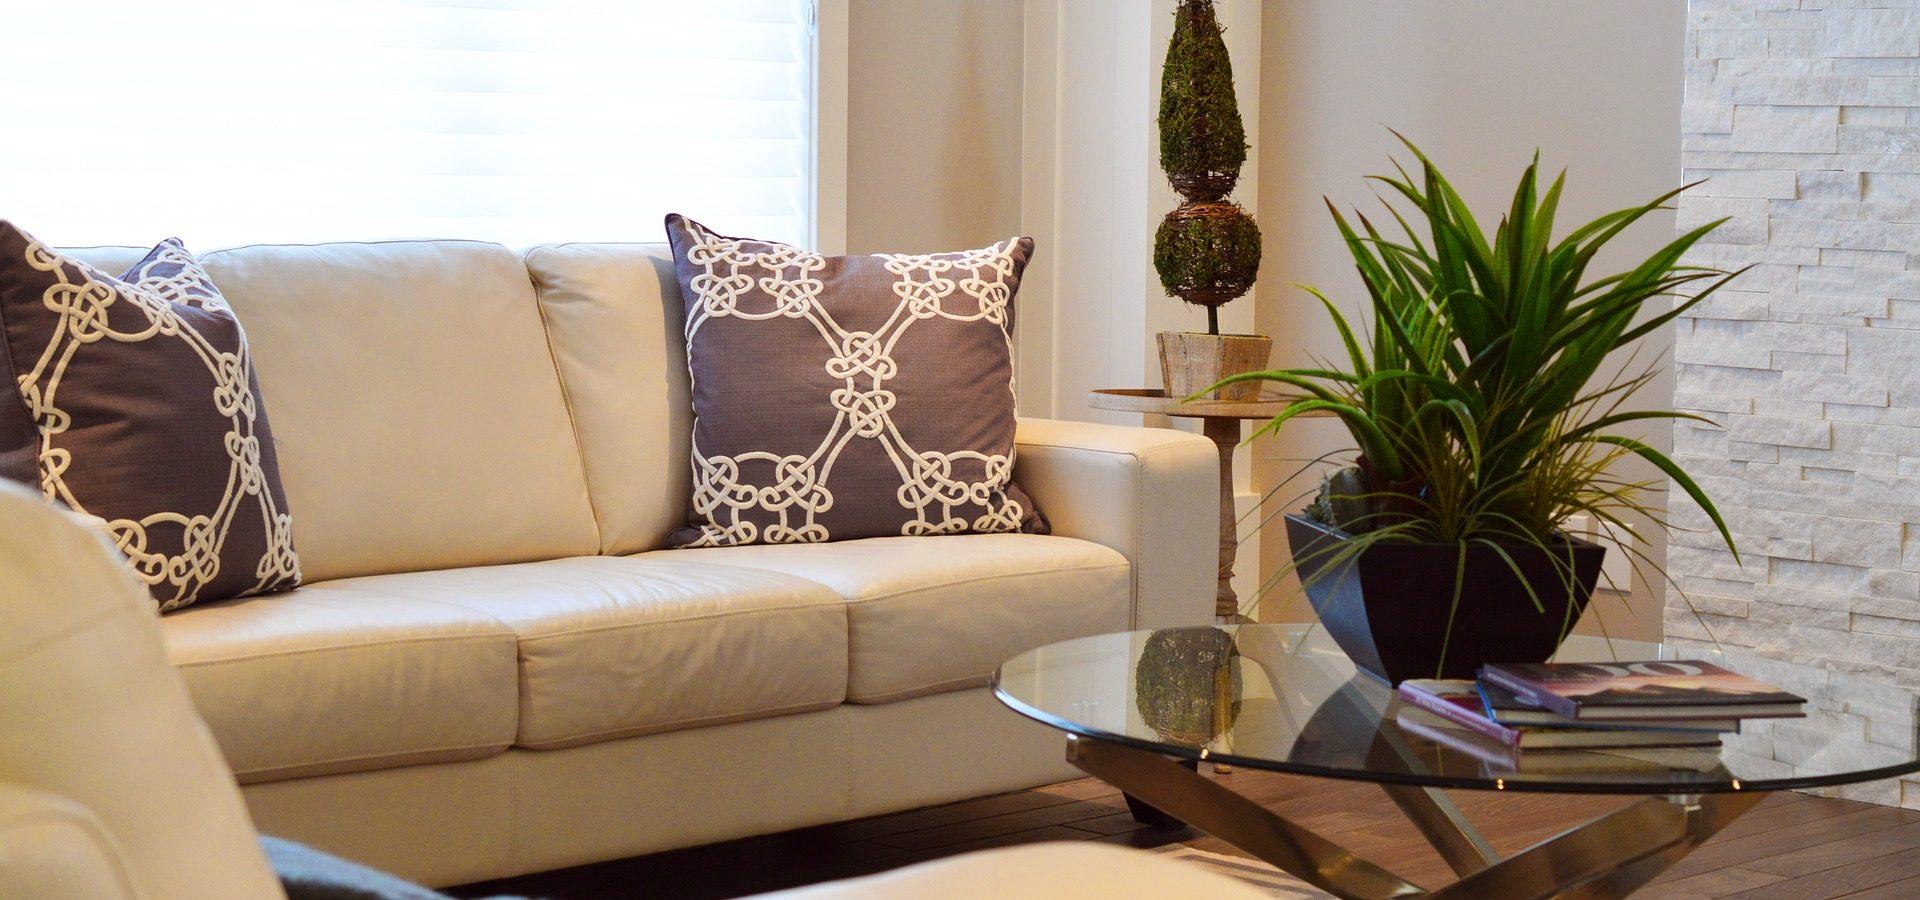 living-room-2174575_1920